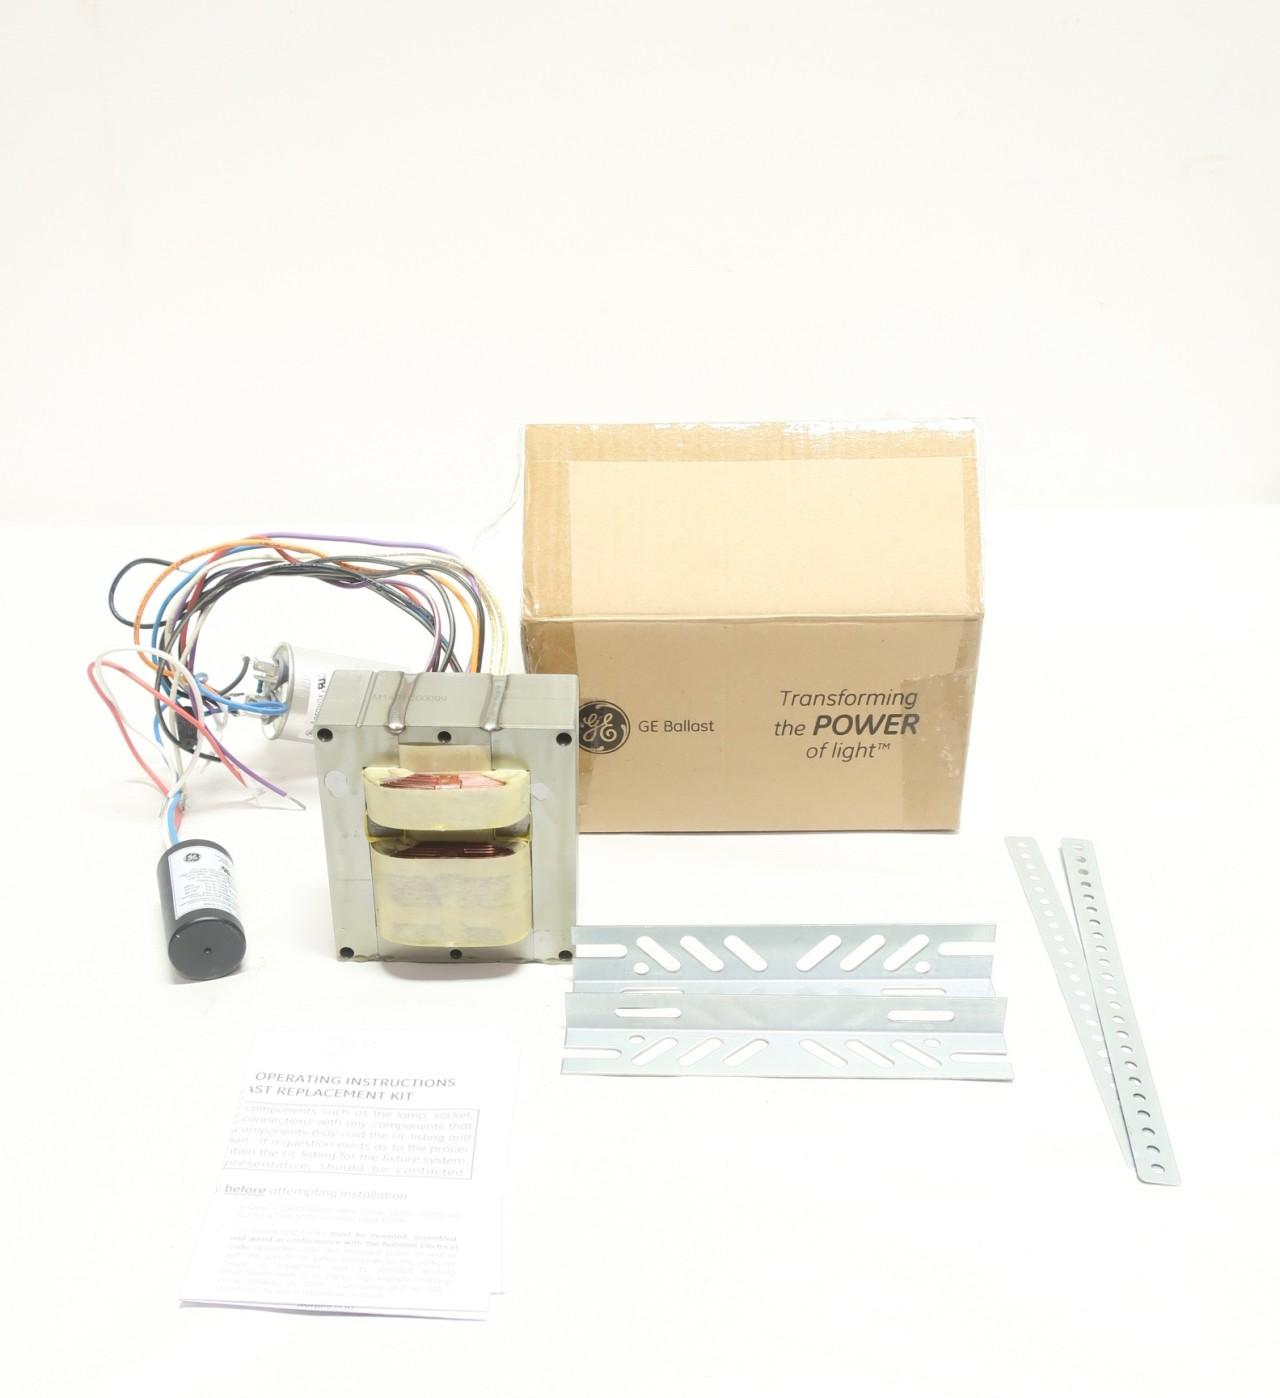 General Electric Ge 35-969920-01 Lowmount Ballast Kit 250w